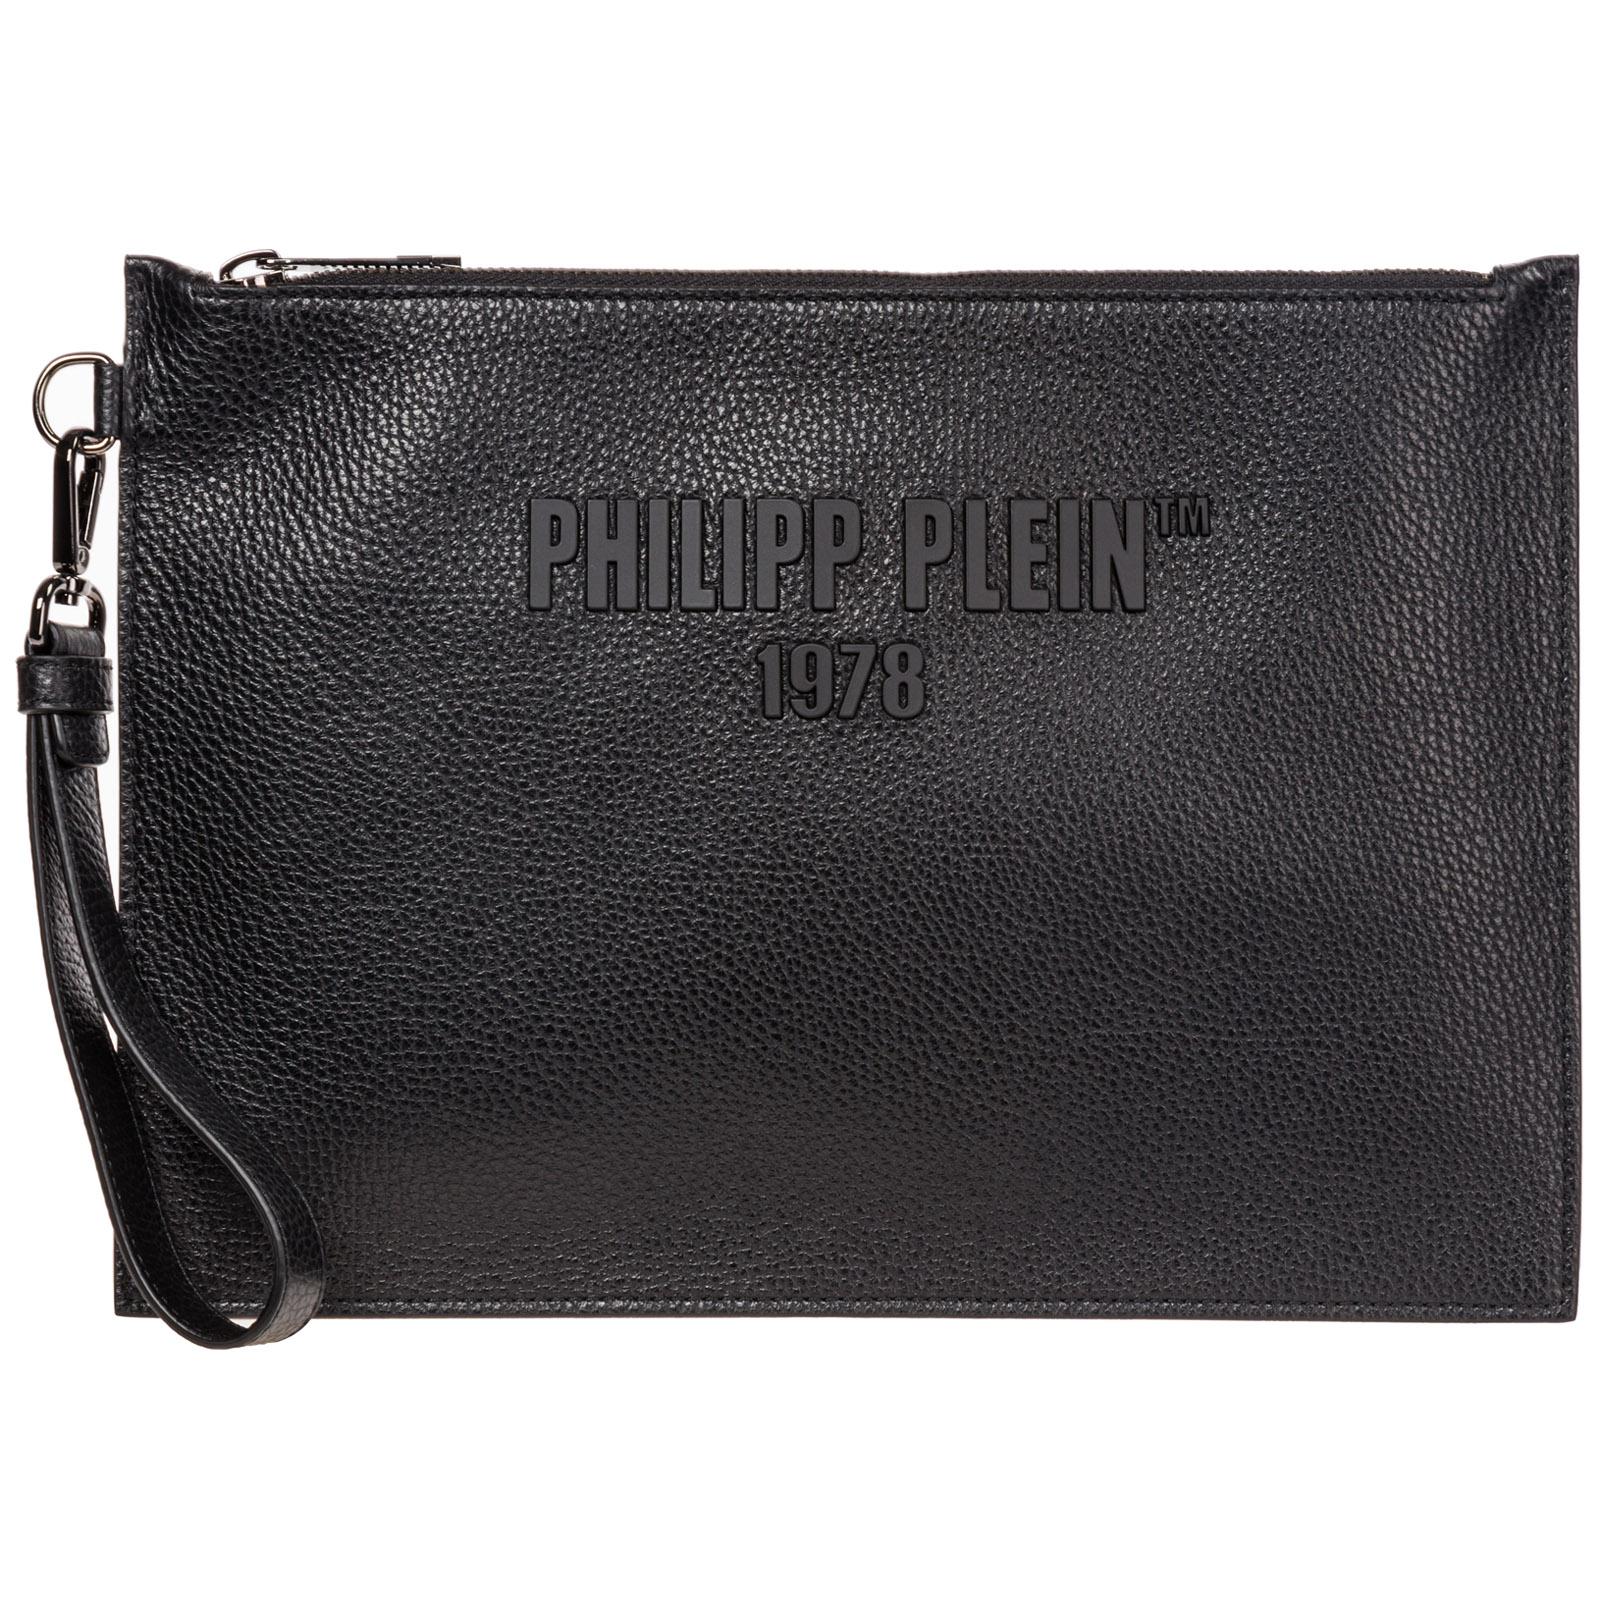 Philipp Plein MEN'S BAG HANDBAG GENUINE LEATHER  PP1978